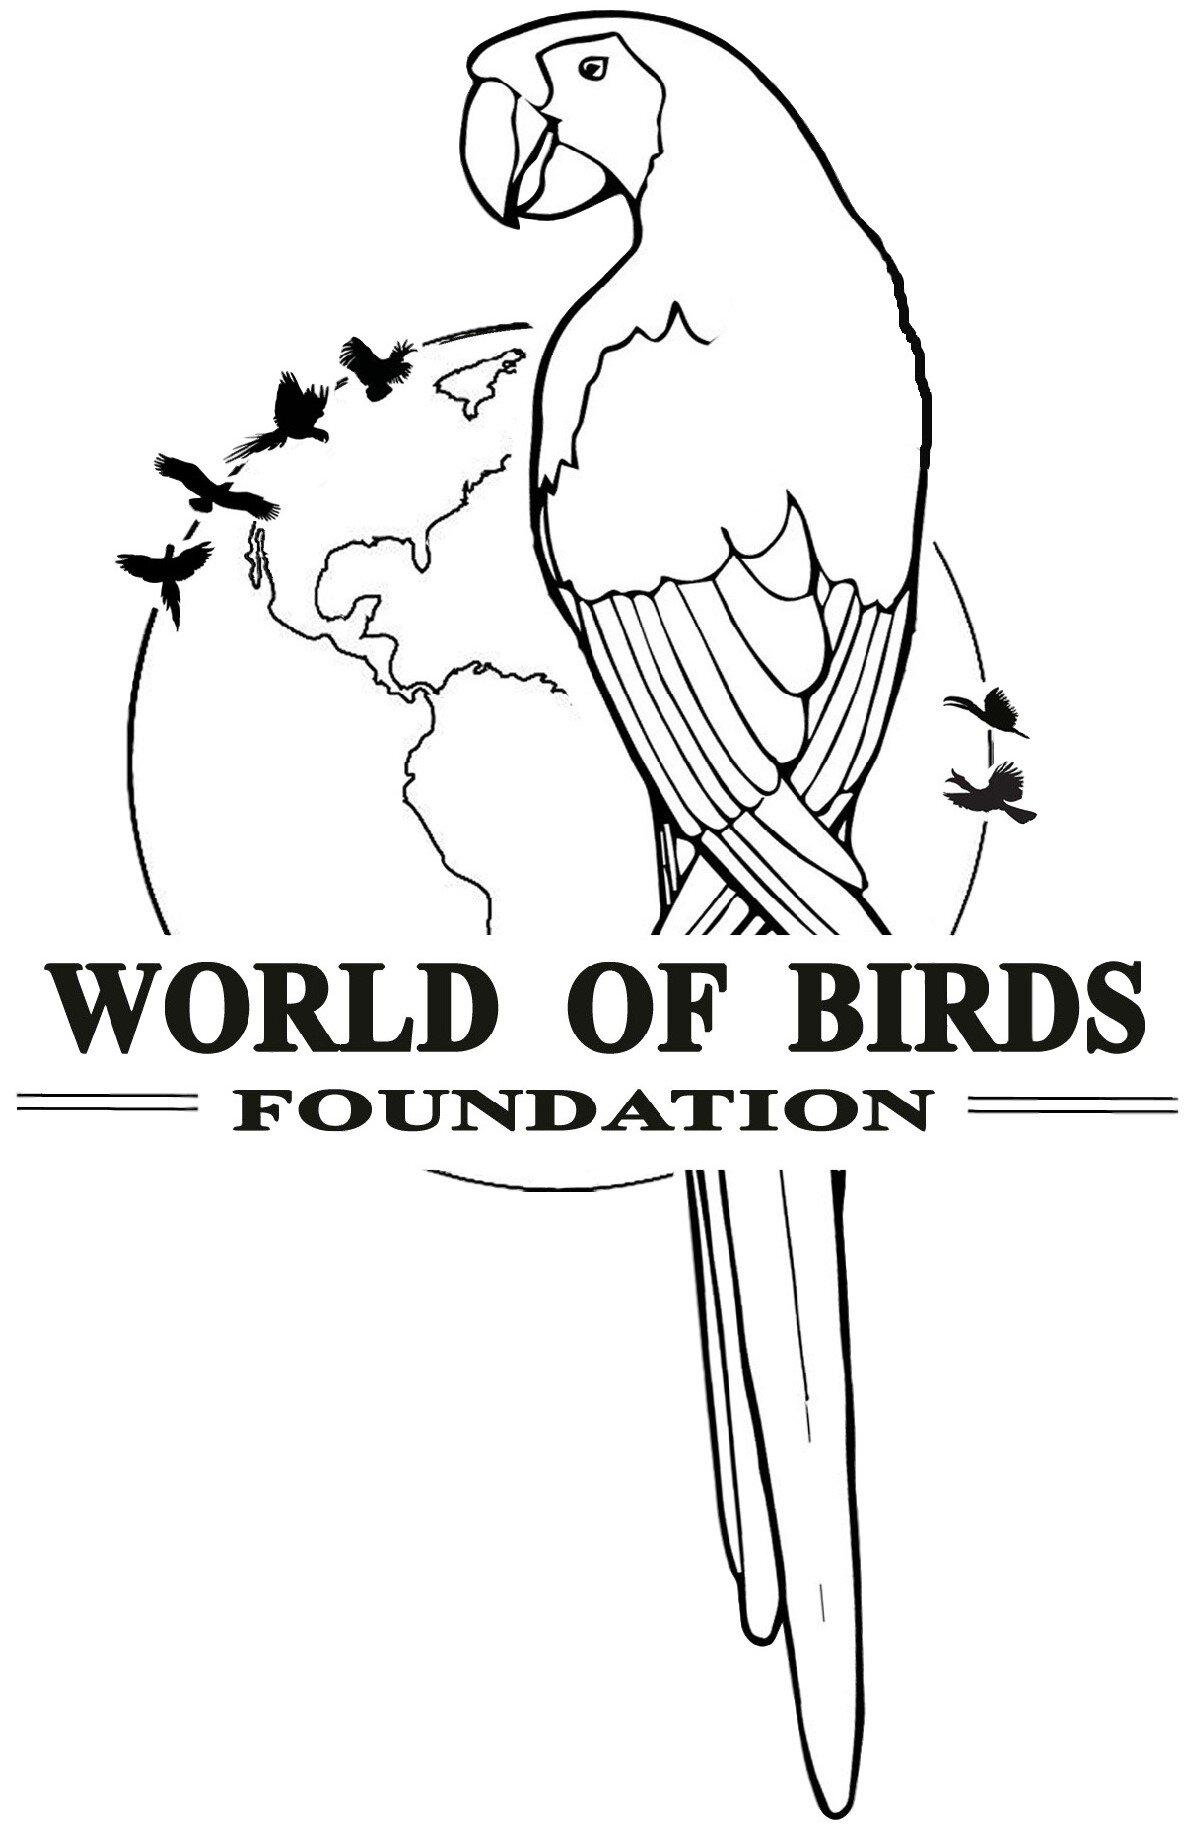 Stichting World of Birds Foundation